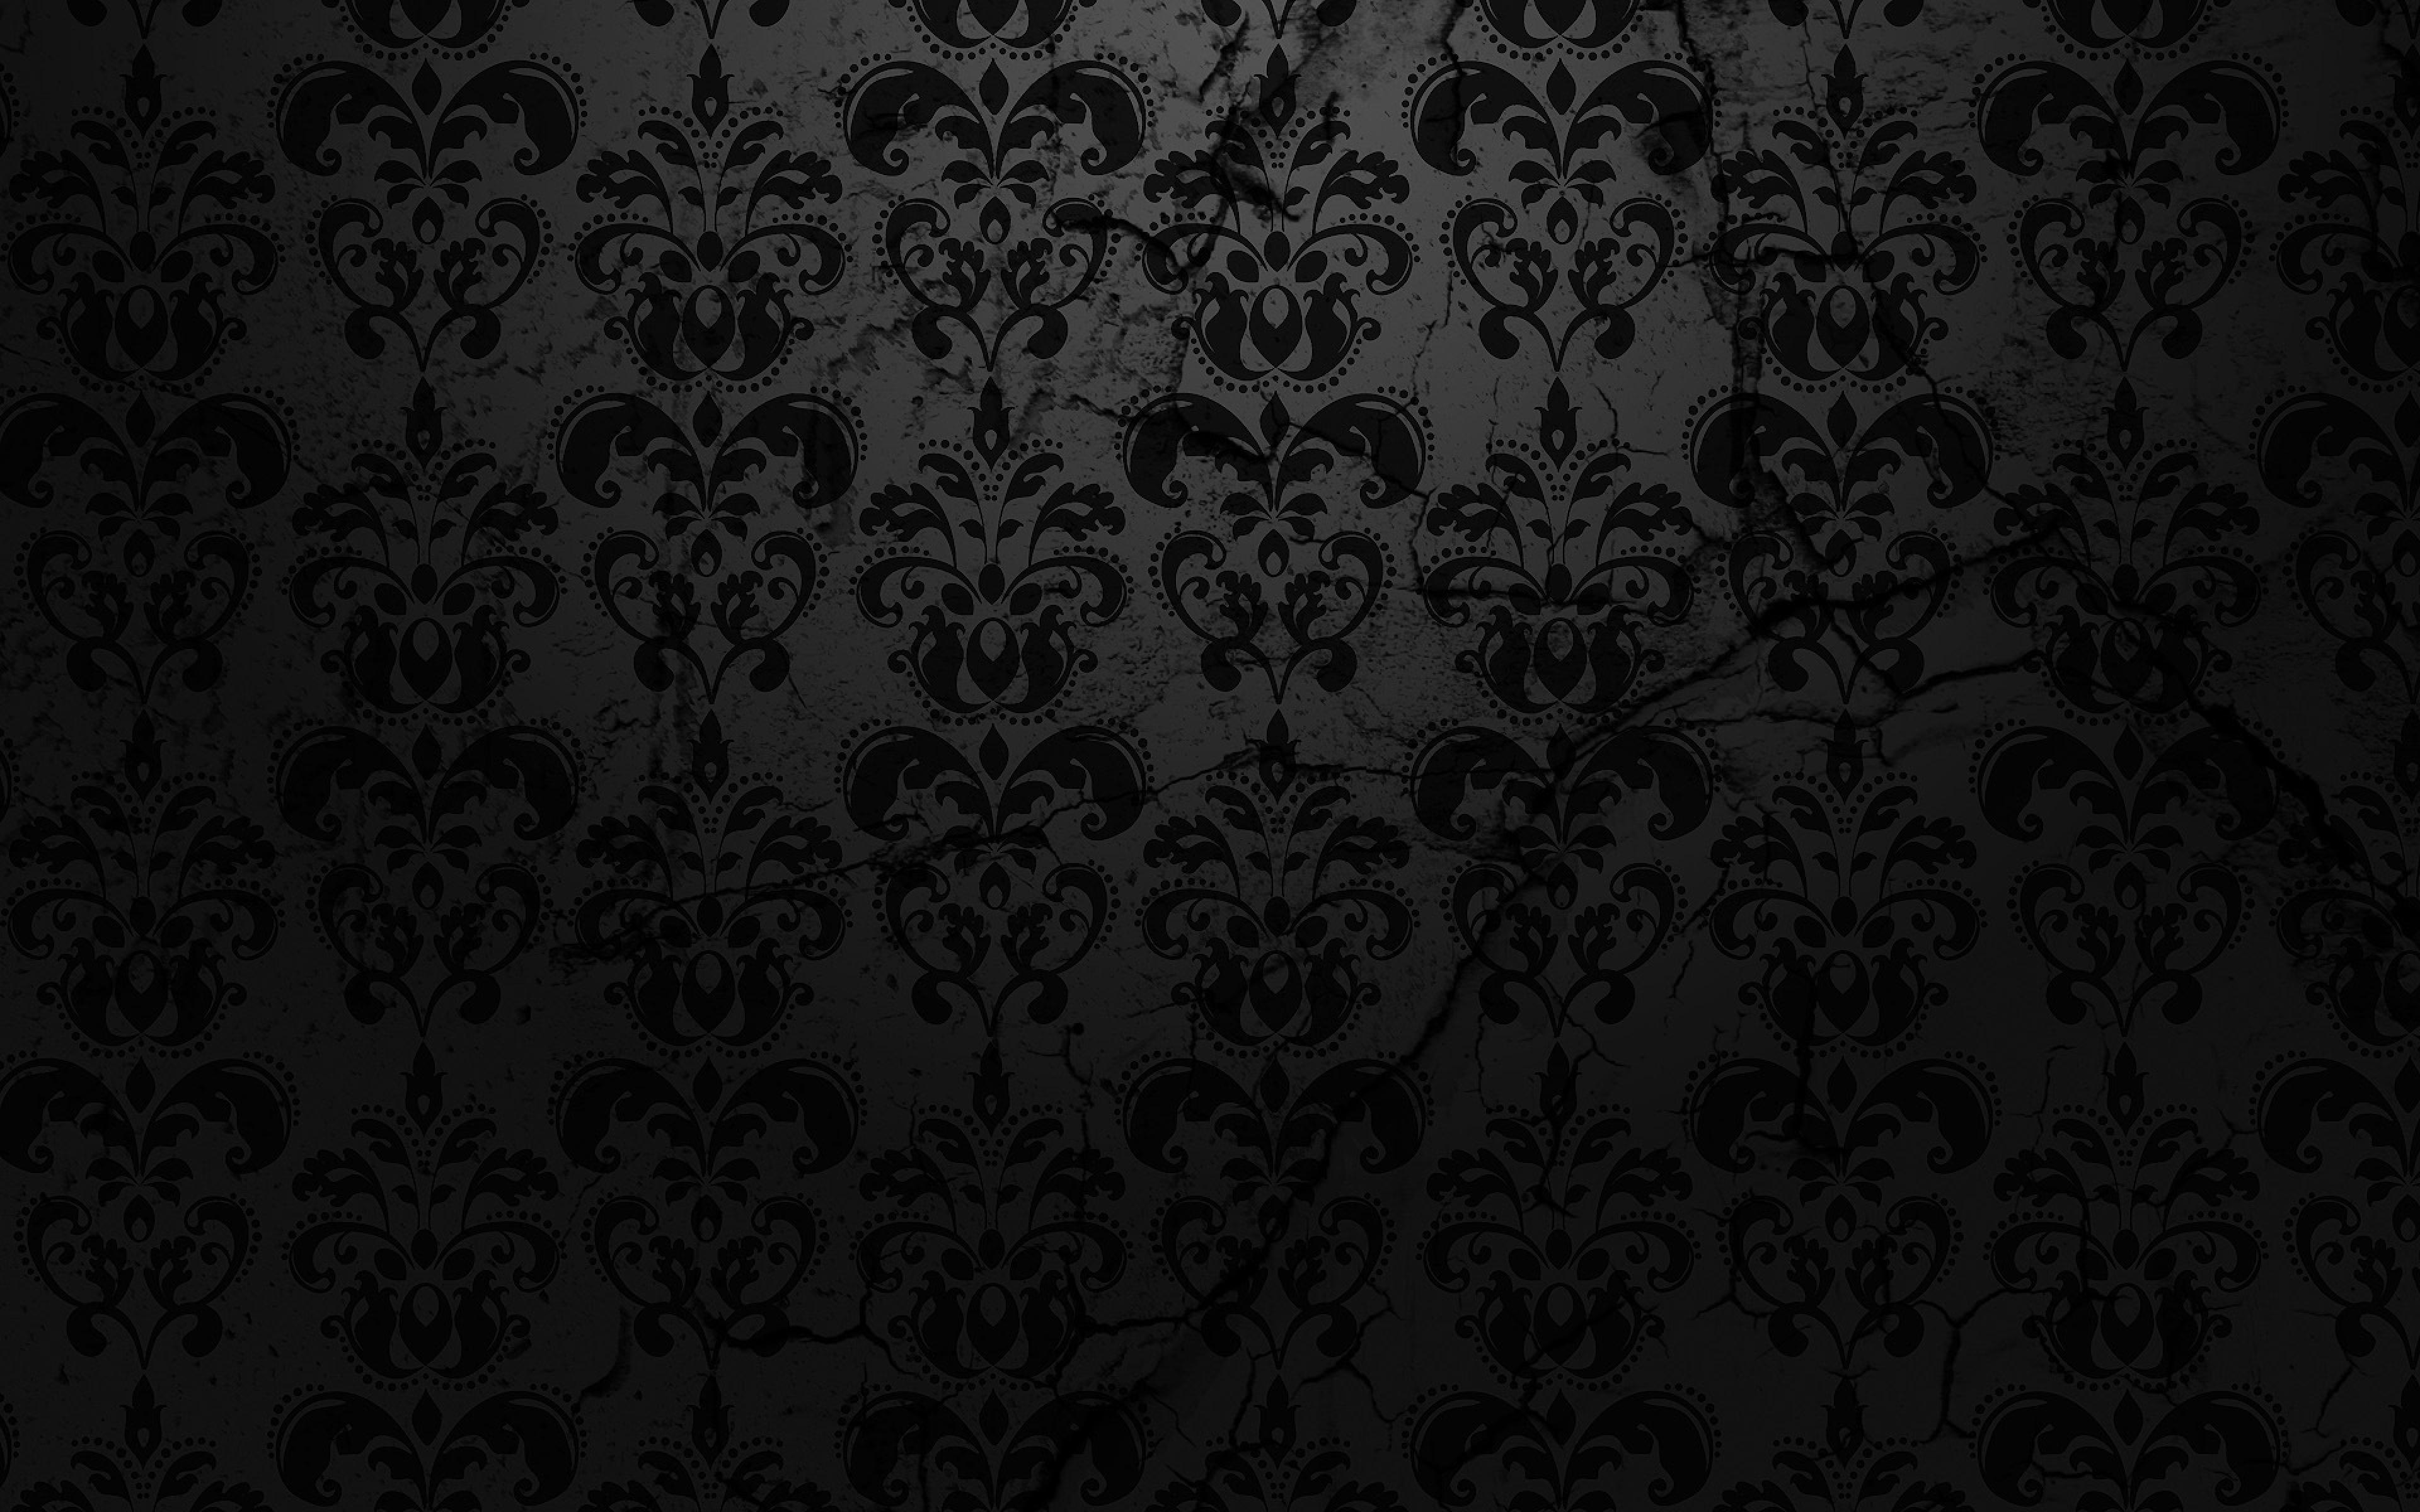 Texture Pattern Black Background Wallpaper Background Ultra HD 4K 3840x2400